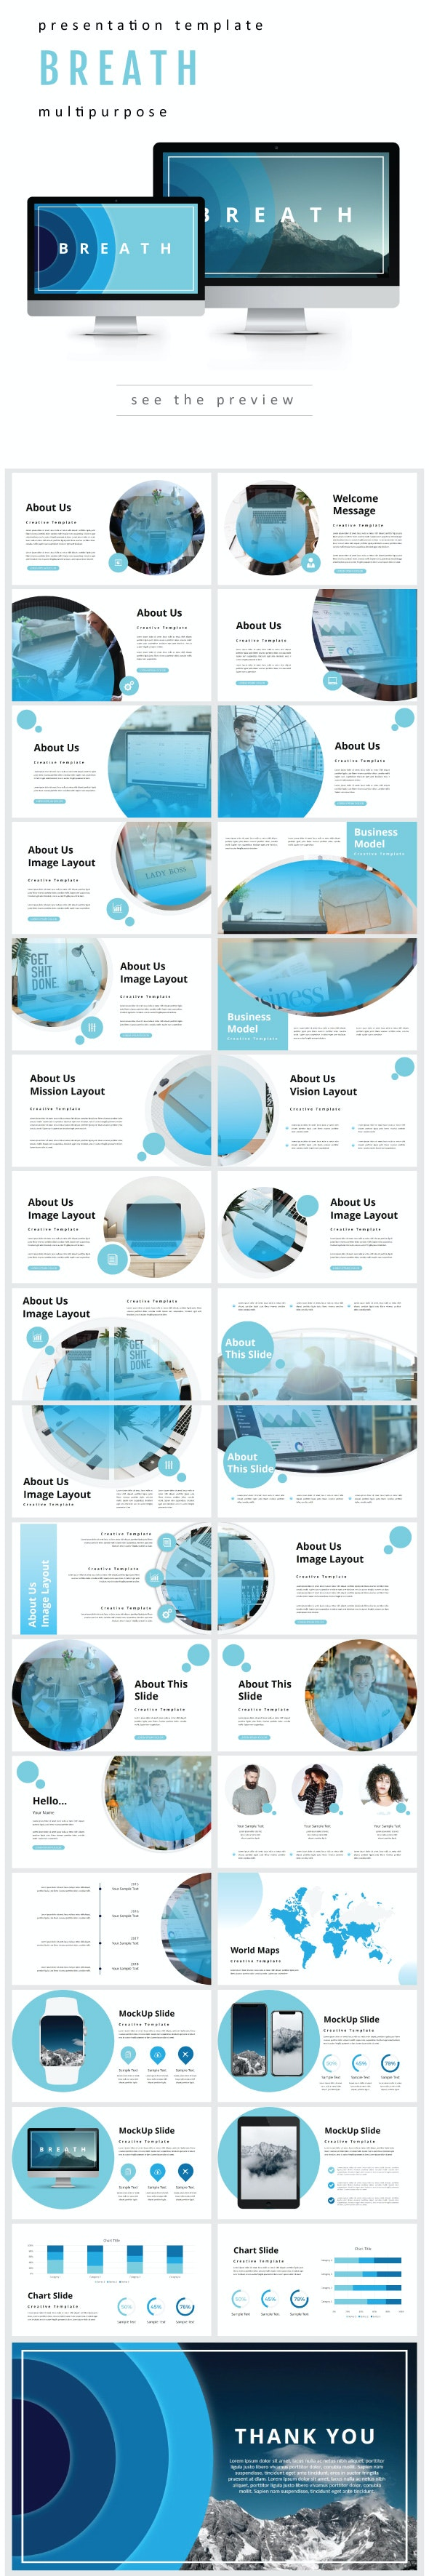 Breath Presentation Templates - Business PowerPoint Templates